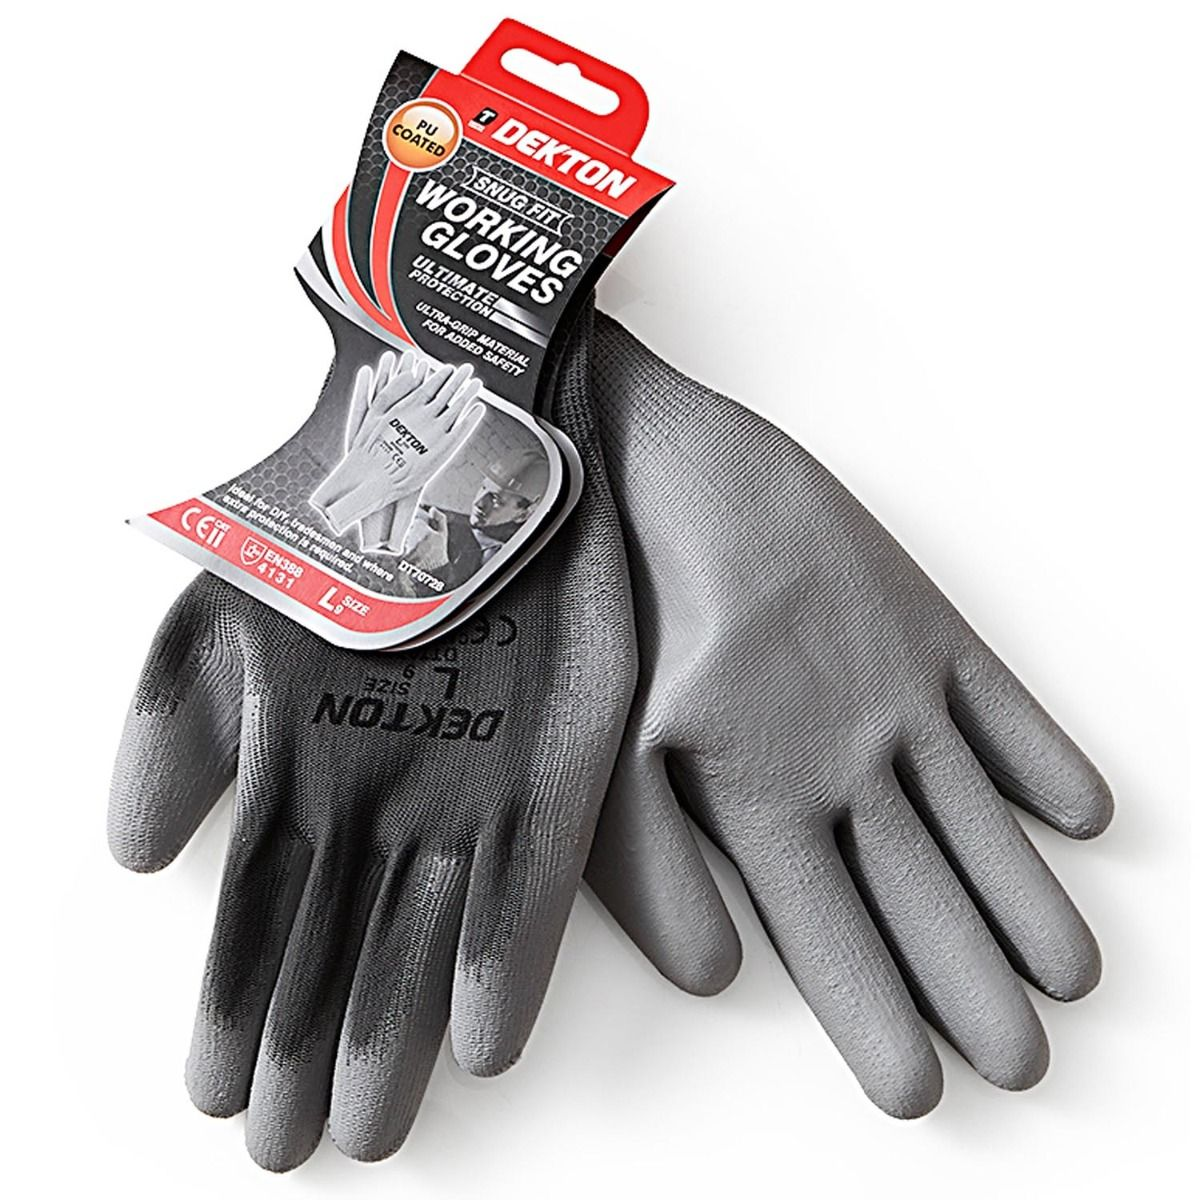 2 PAIRS  DEKTON GREY Working Gloves Snug Fit PU Coated Ultra-grip Size XL UK